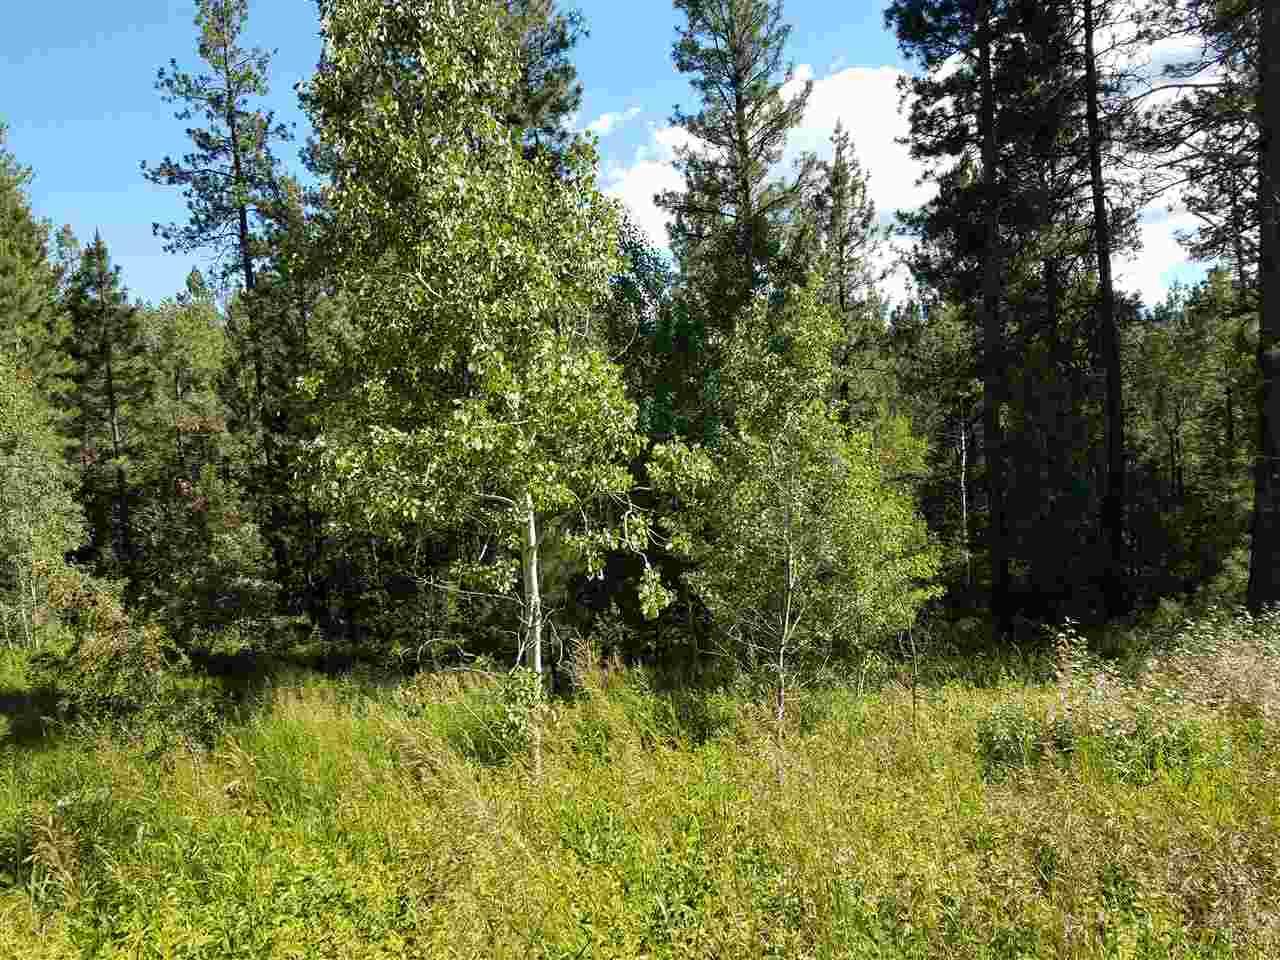 Land for Sale at 37 Shady Pine Wy 37 Shady Pine Wy Cascade, Idaho 83631